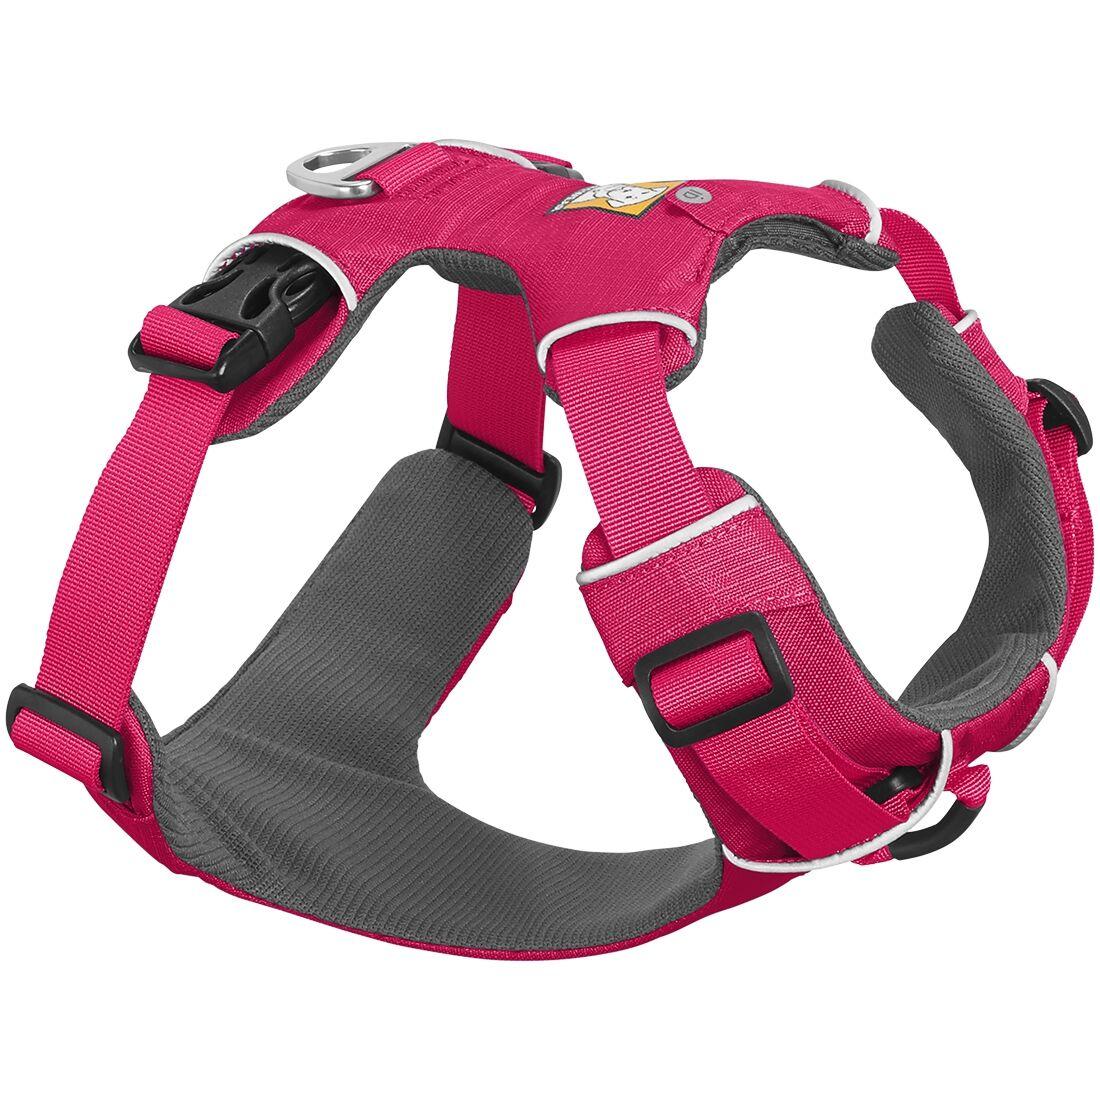 Ruffwear Harnais pour chien Ruffwear Front Range rose Taille : XXS